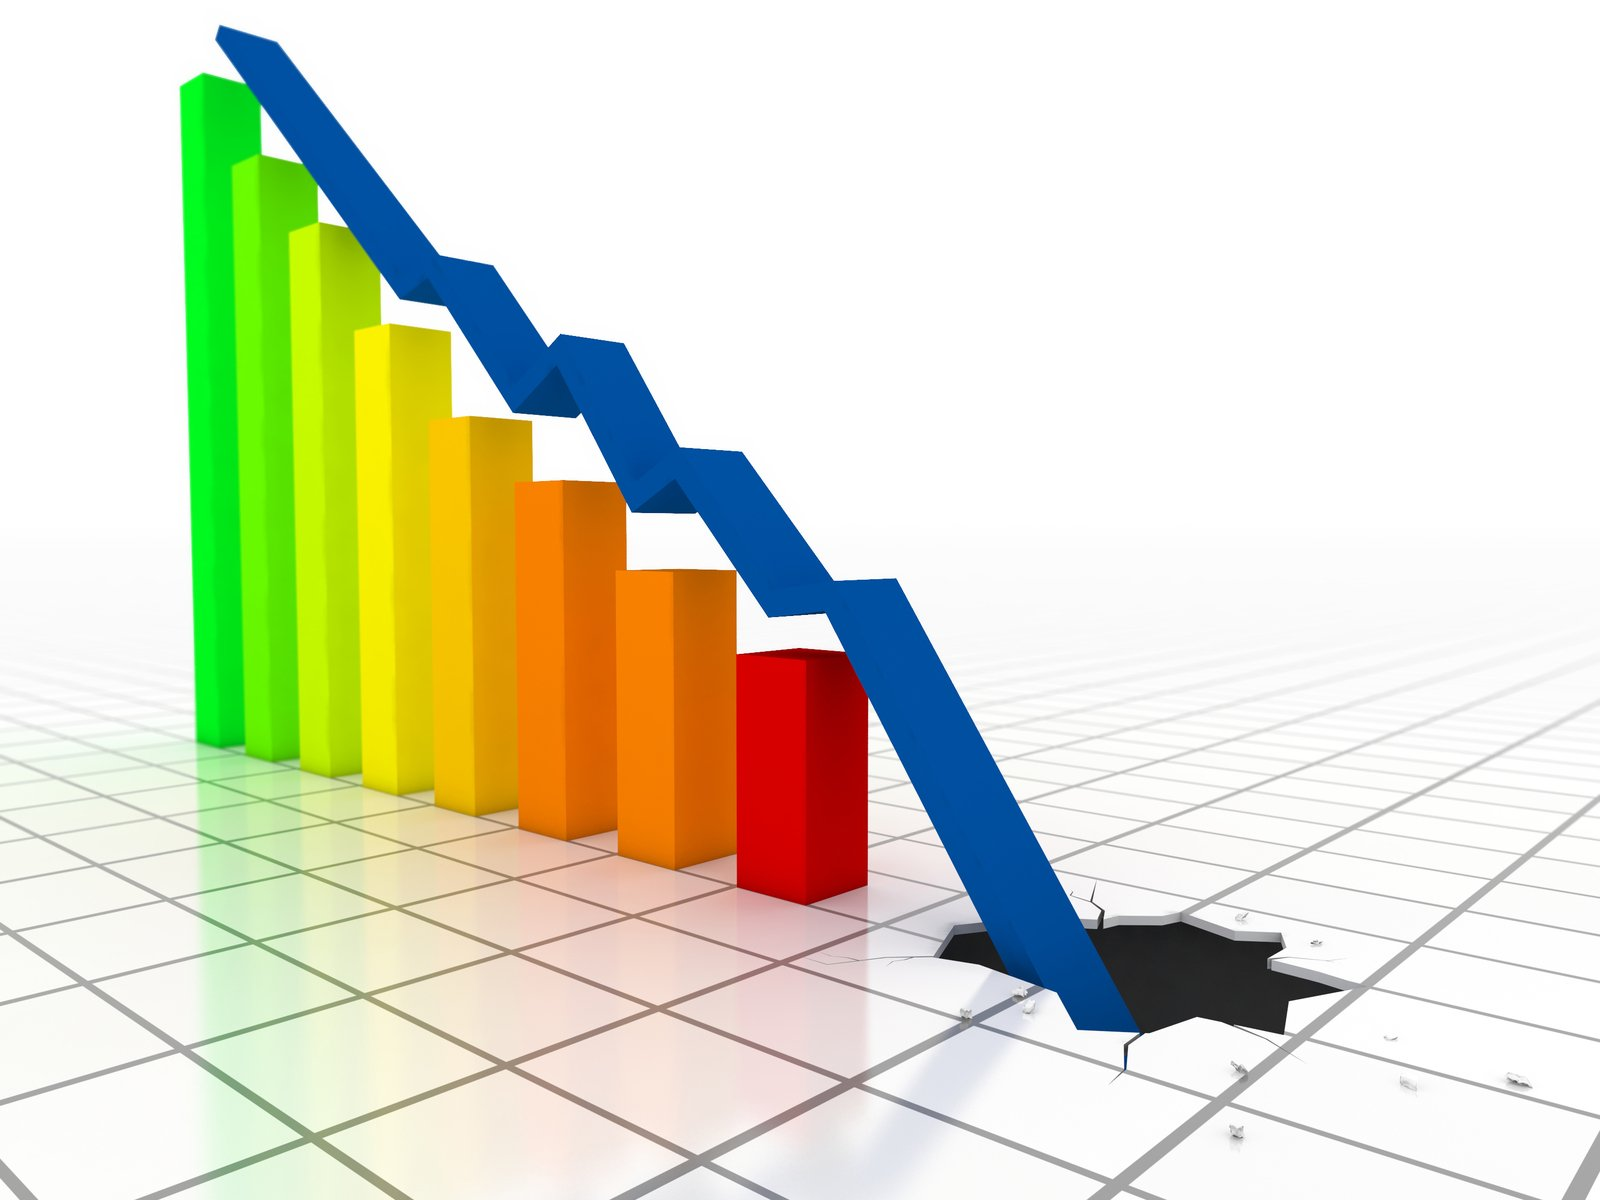 Hasil gambar untuk ketidakstabilan ekonomi